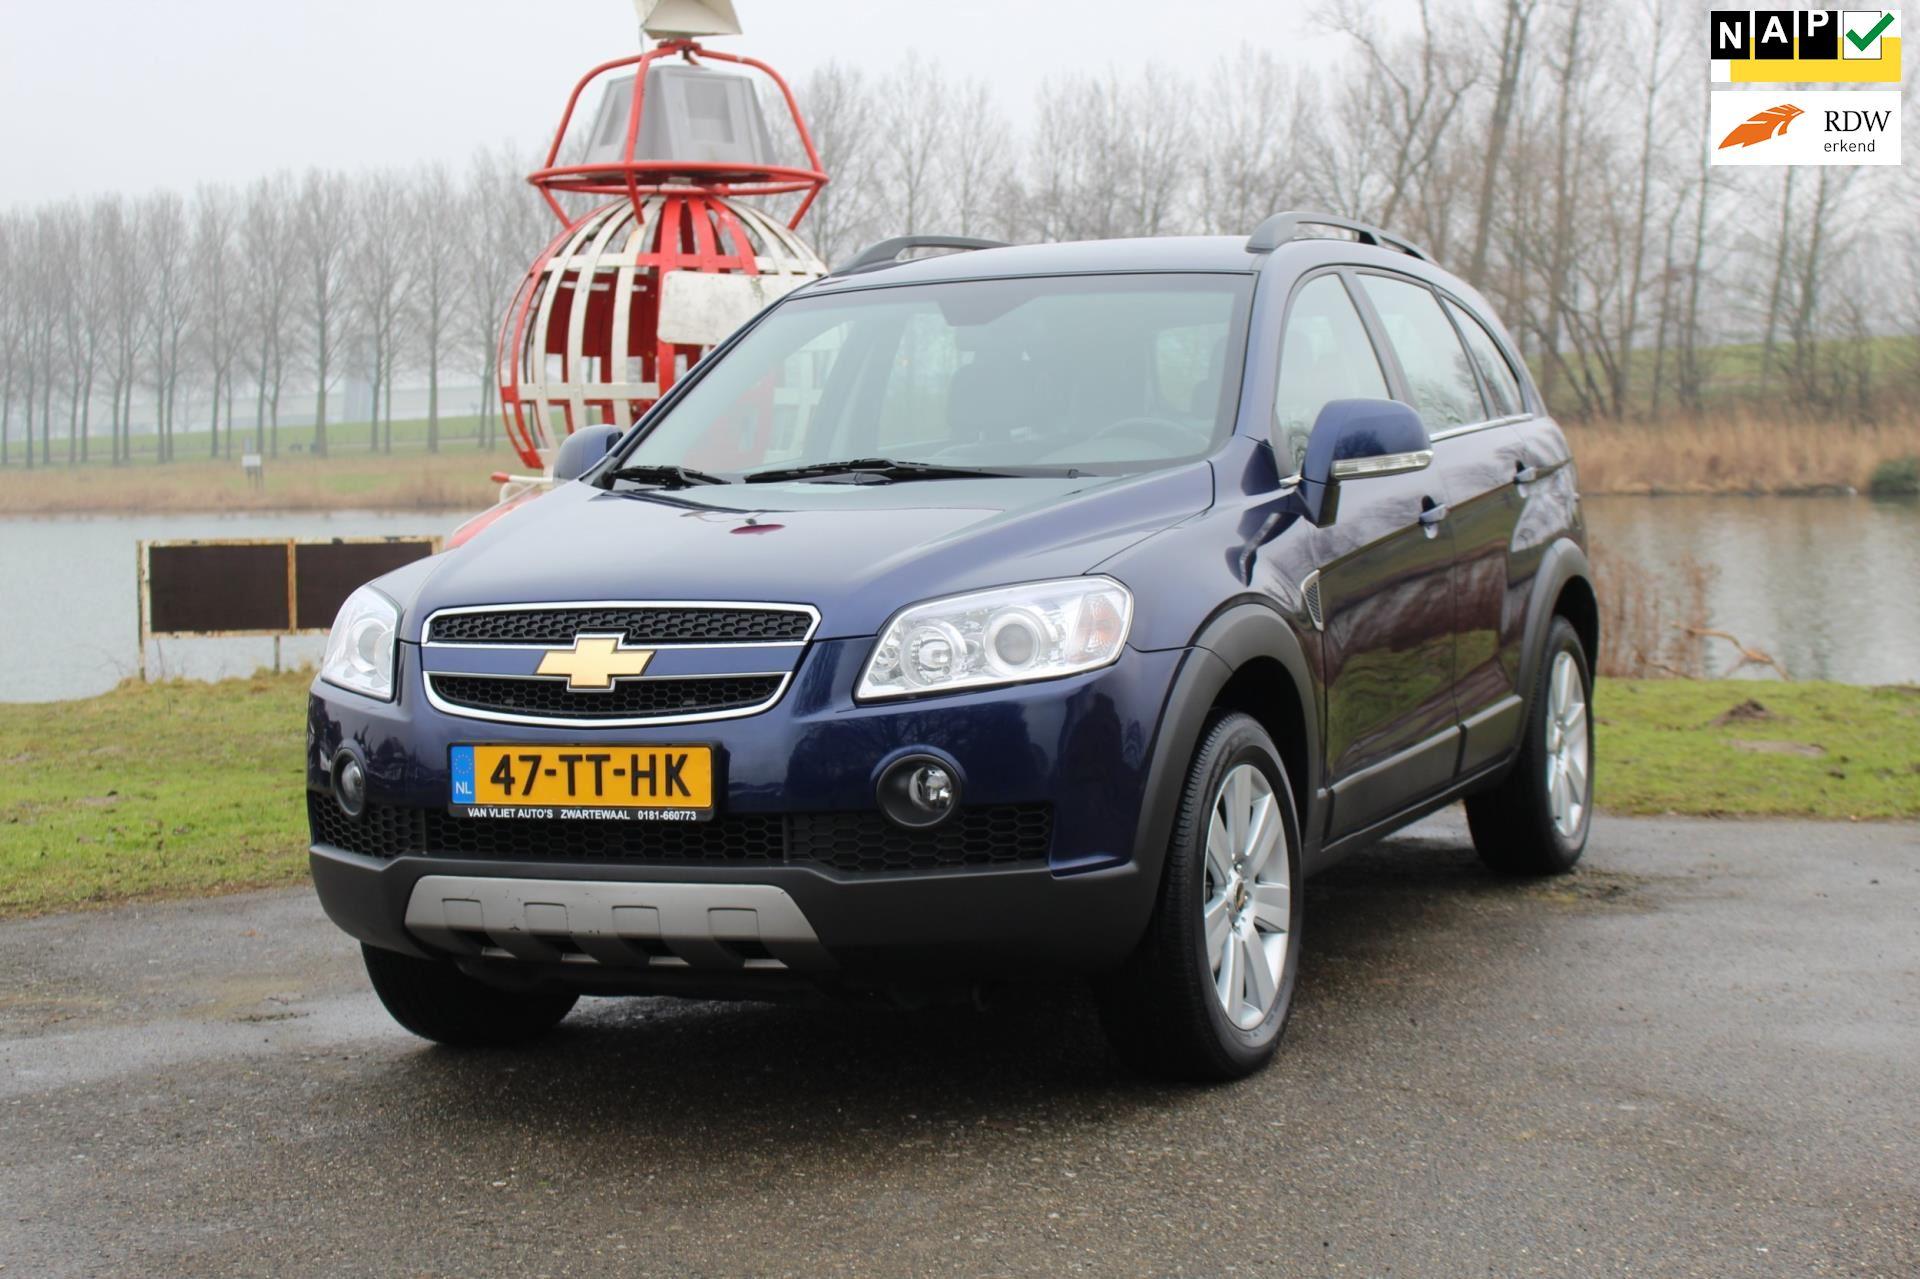 Chevrolet Captiva occasion - Van Vliet Auto's